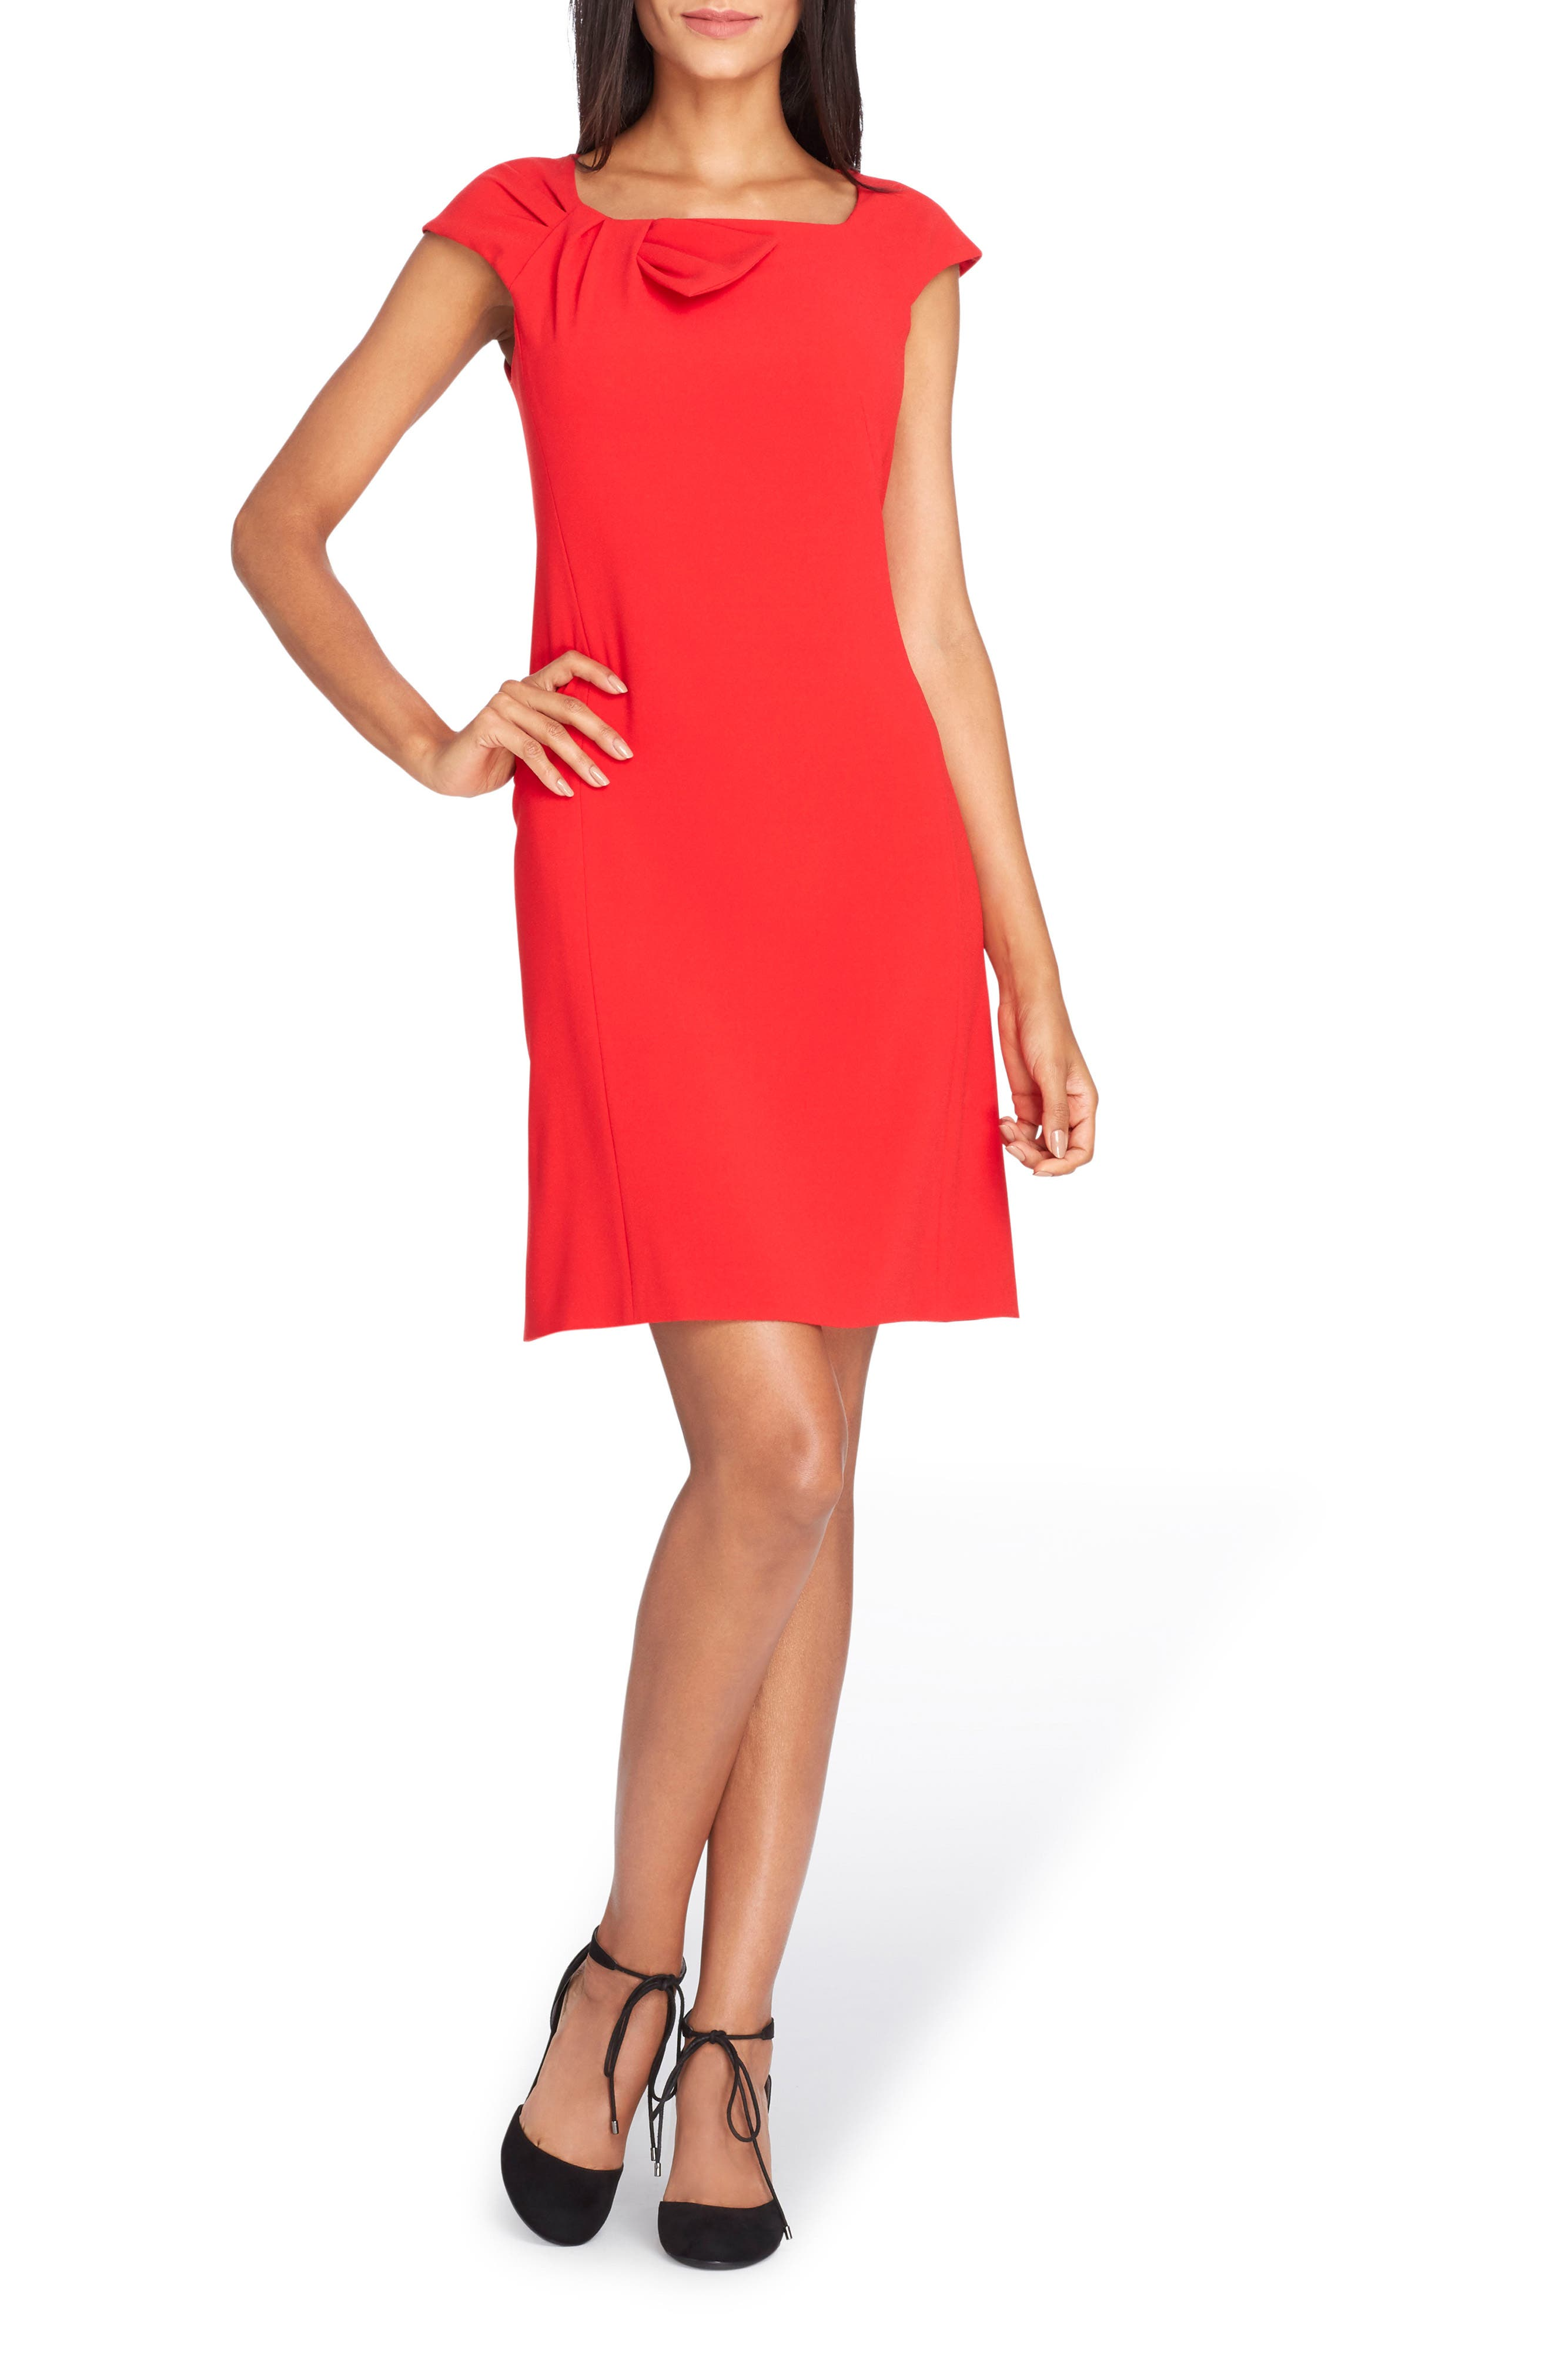 Alternate Image 1 Selected - Tahari Bow Neck Sheath Dress